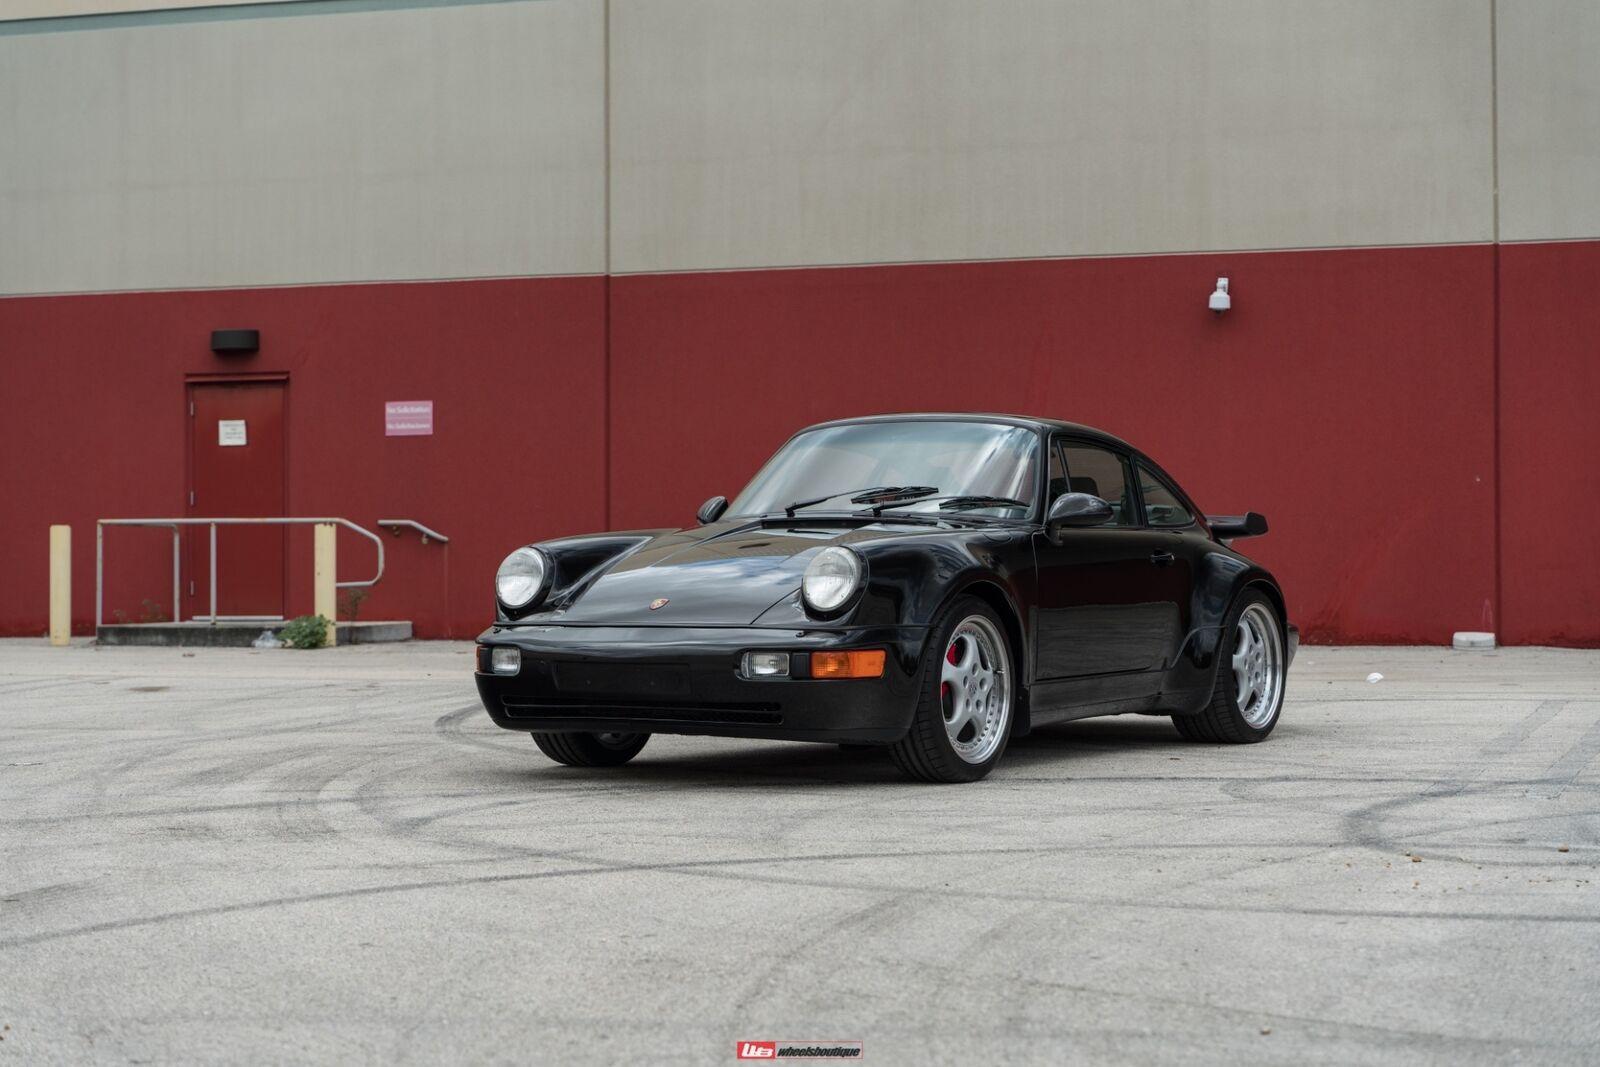 1994 Porsche 911 964 Turbo 3.6 Coupe-ULTRA RARE AND FRESHLY SERVICED! COLLECTOR